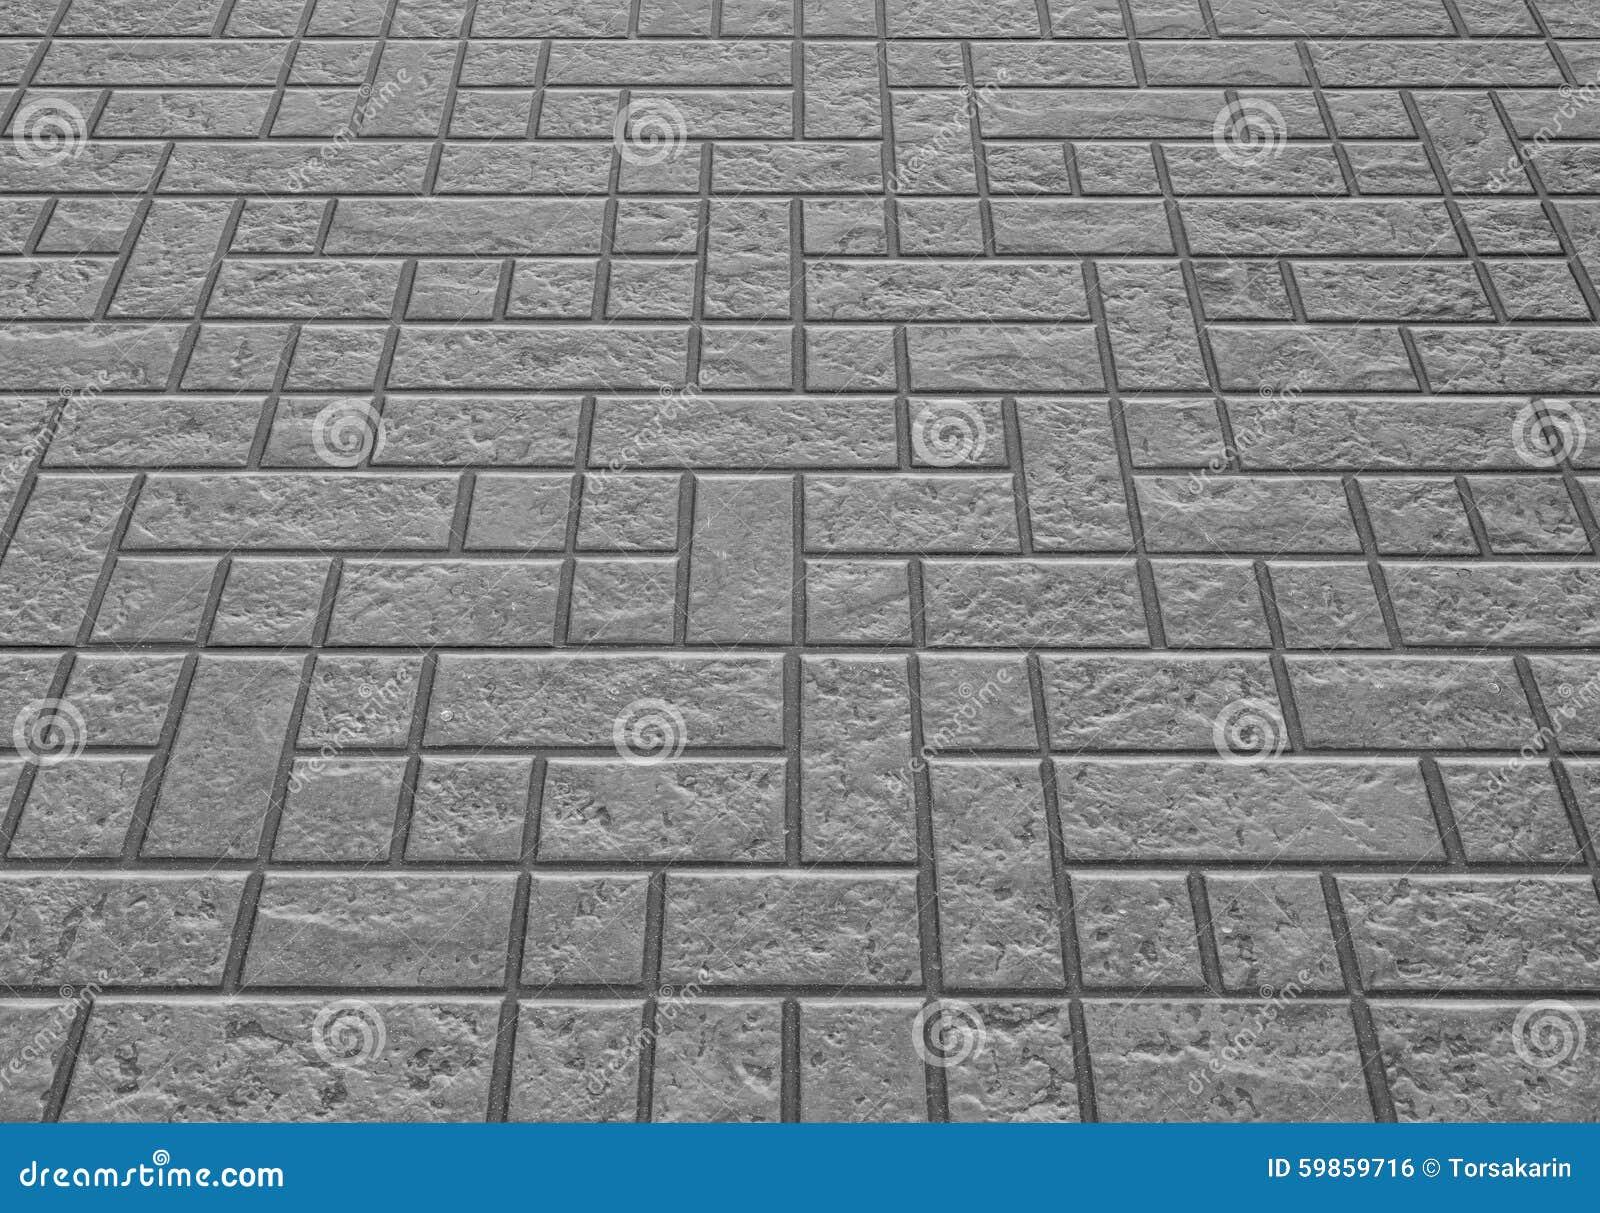 Concrete Block Floor Background And Texture Stock